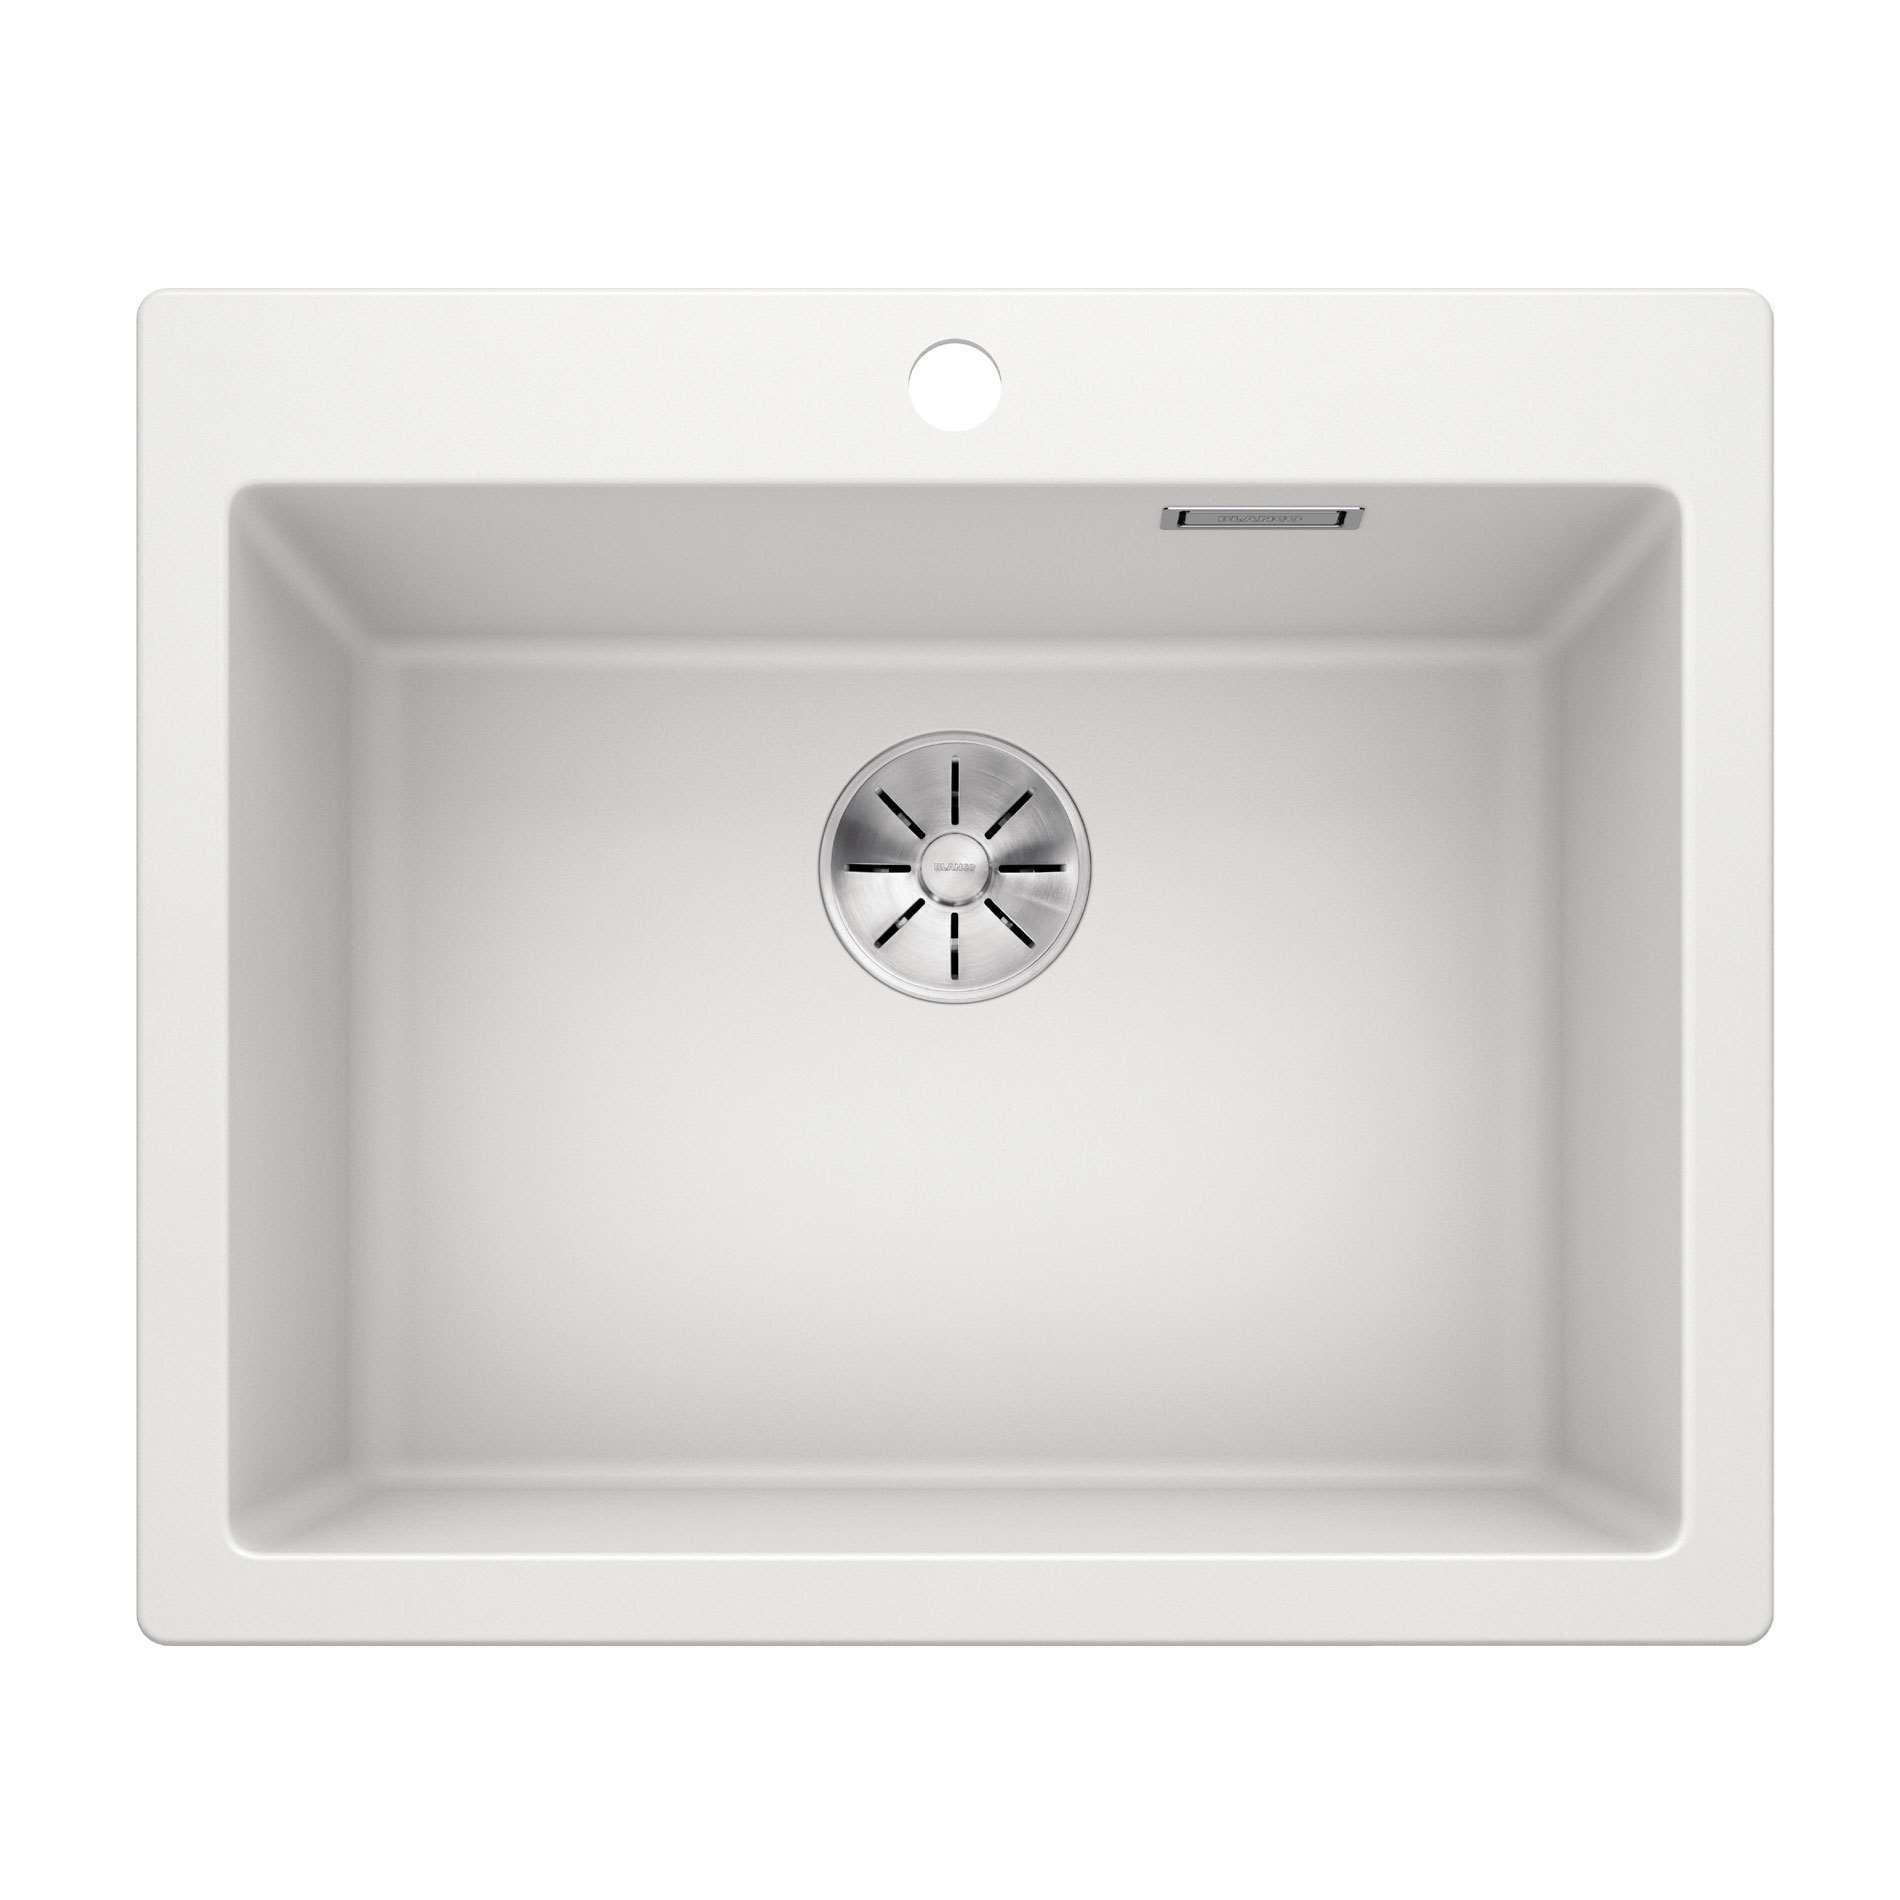 Picture of Pleon 6 White Silgranit Sink